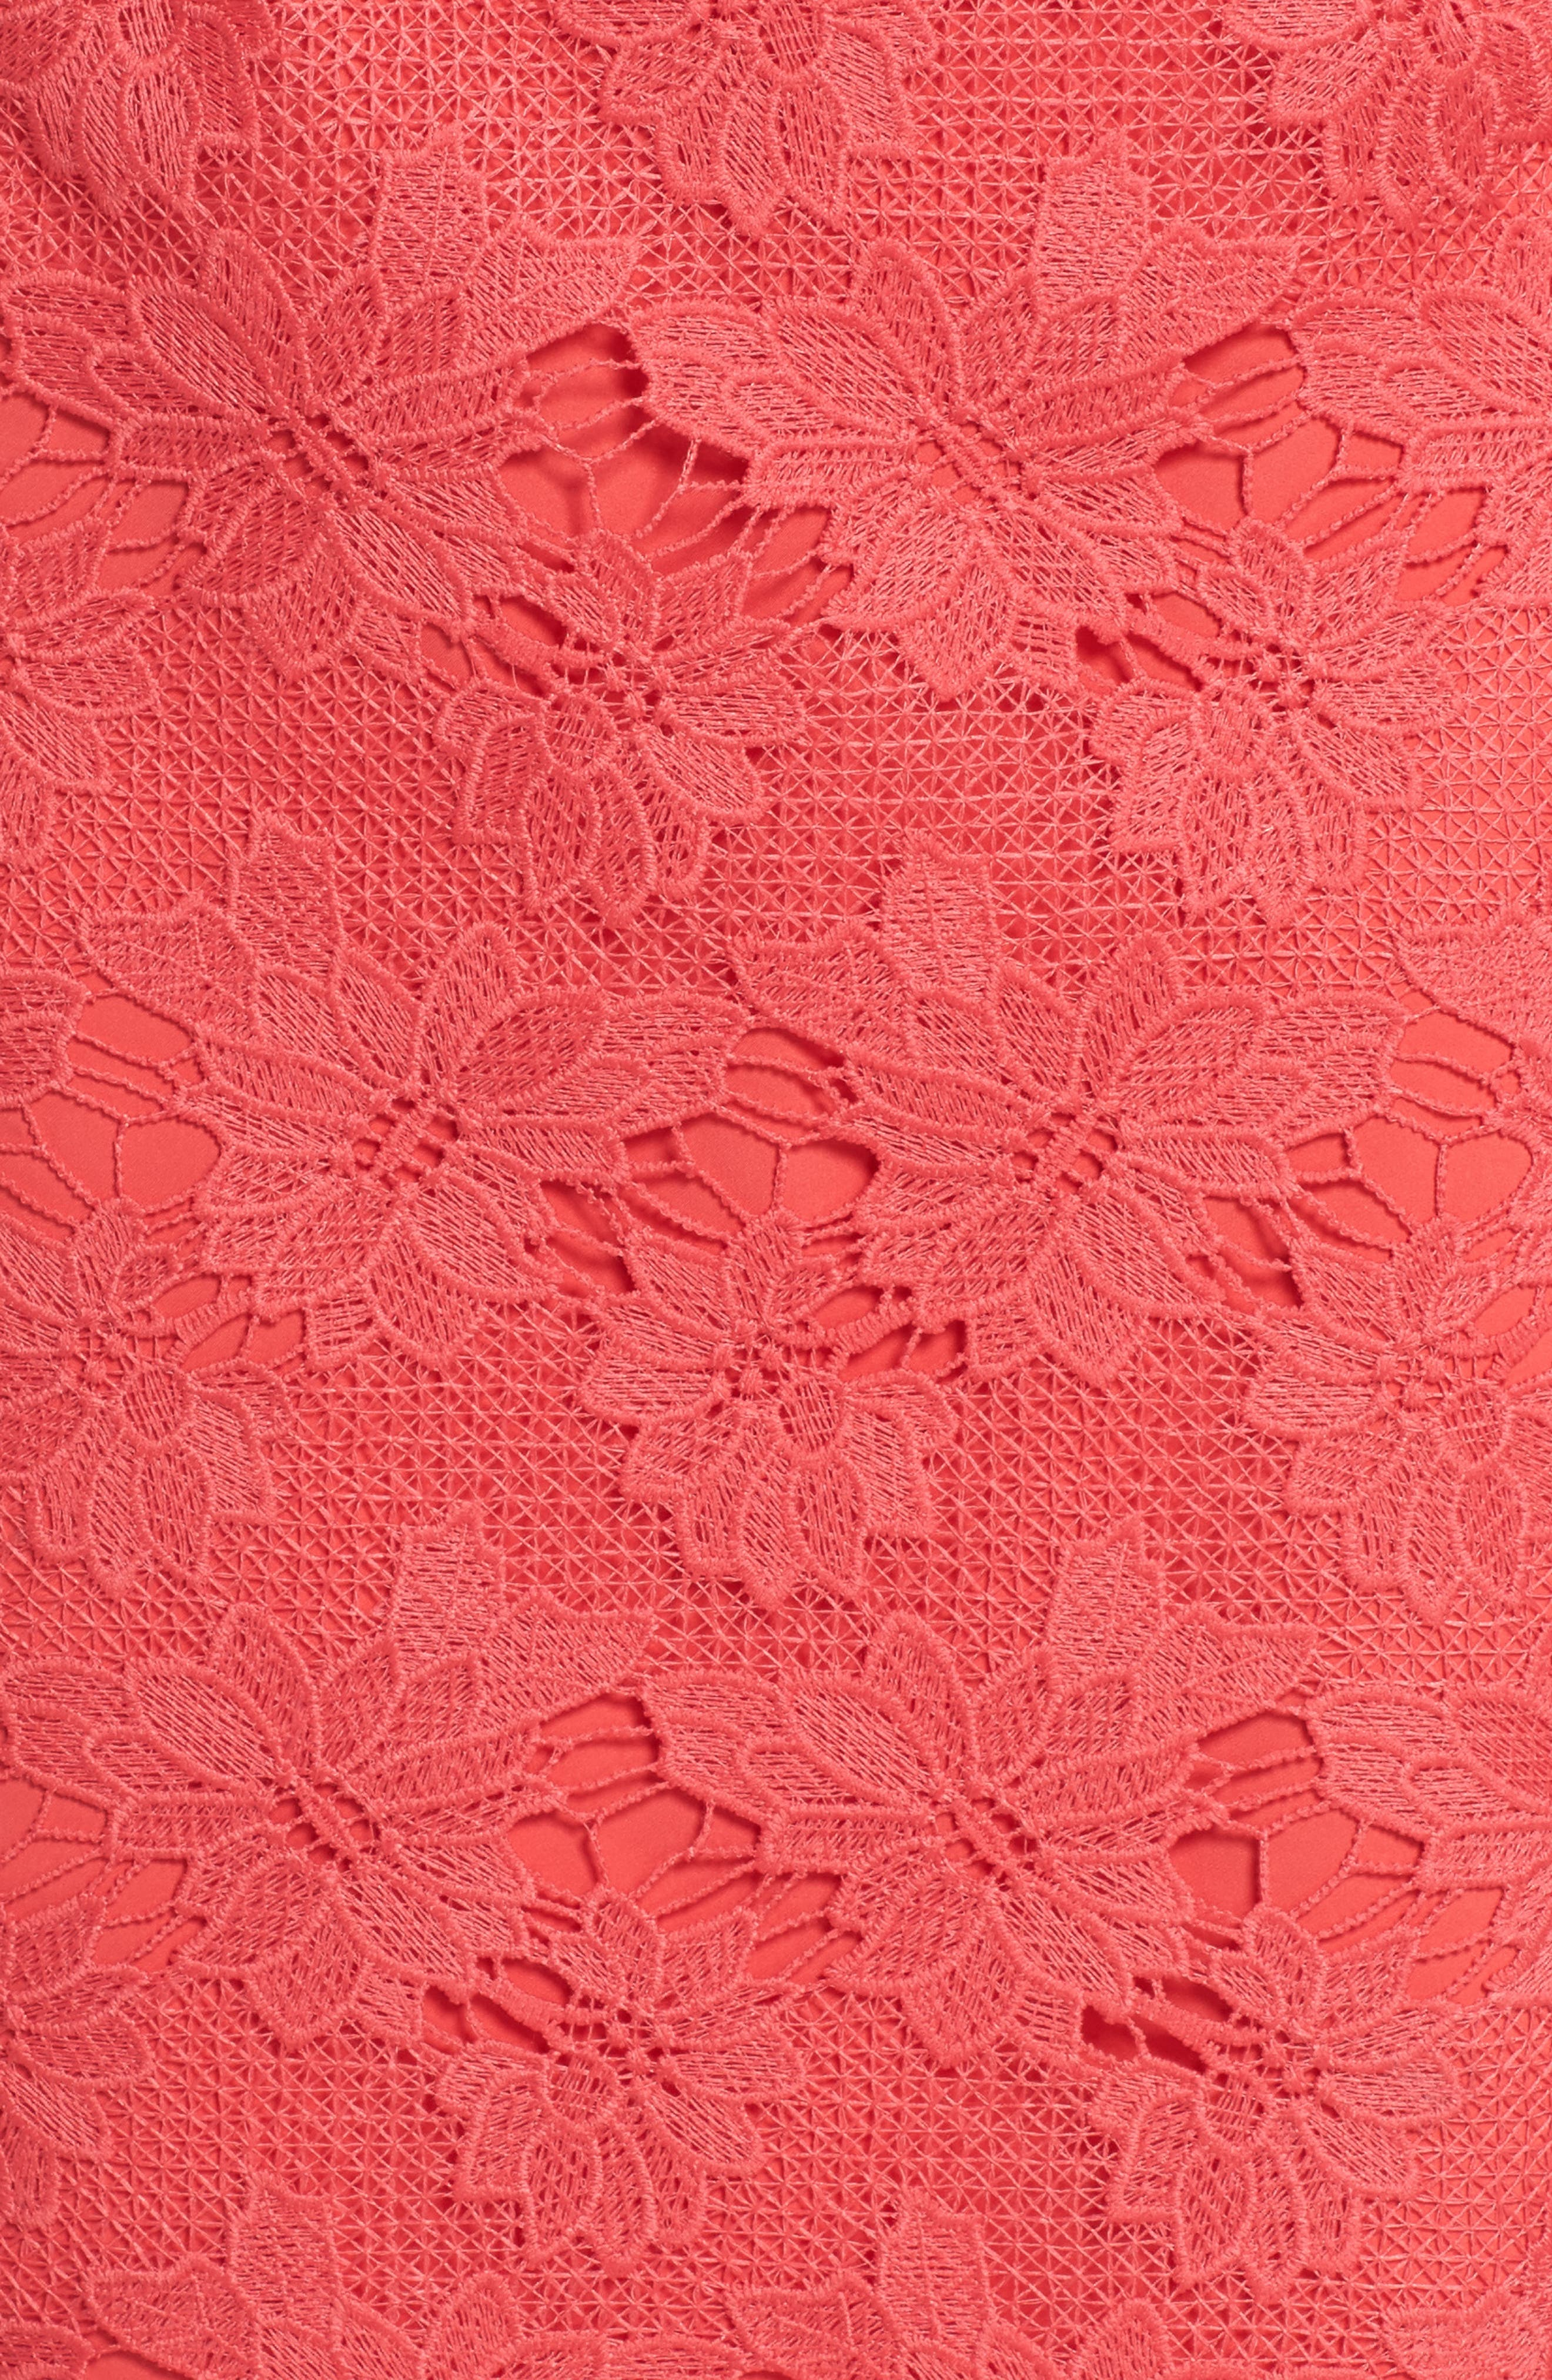 Poppy Off the Shoulder Lace Dress,                             Alternate thumbnail 5, color,                             Poppy